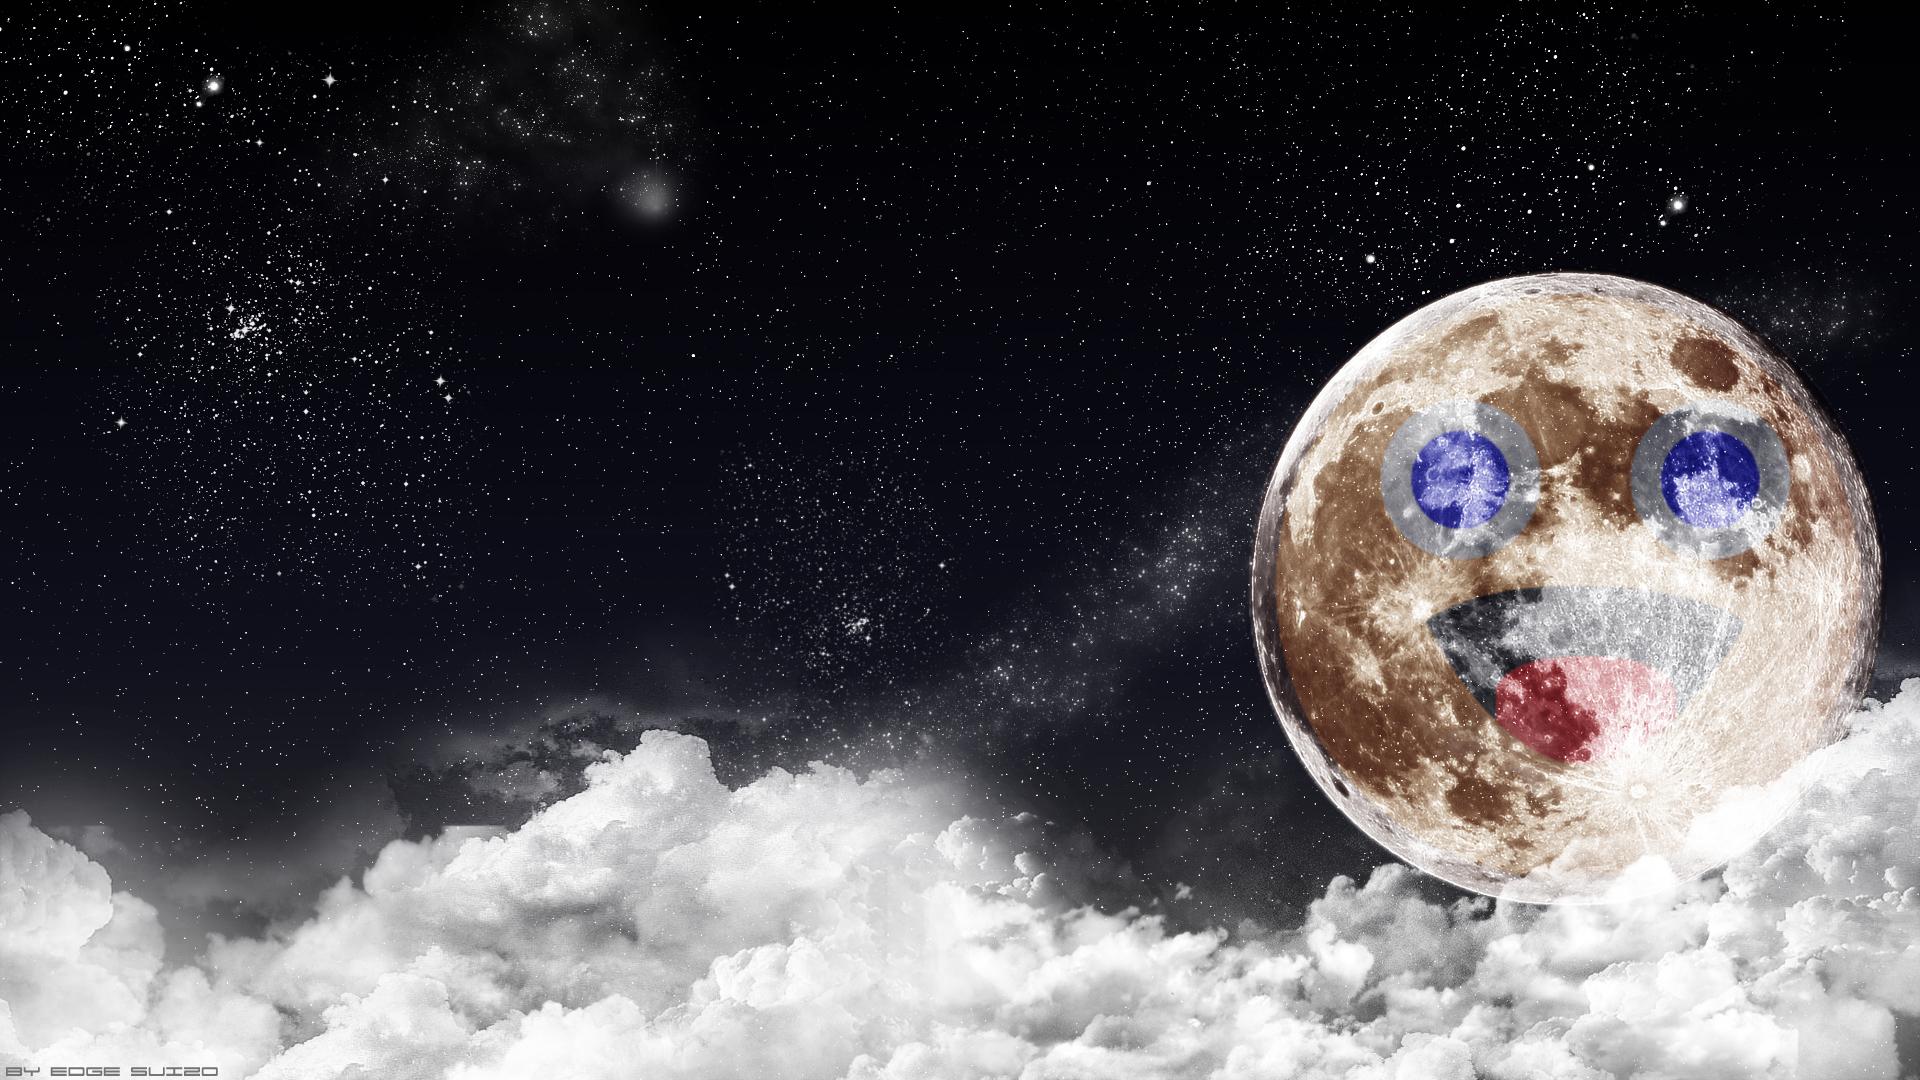 Zippy Moon Wallpaper by Edge-Suizo